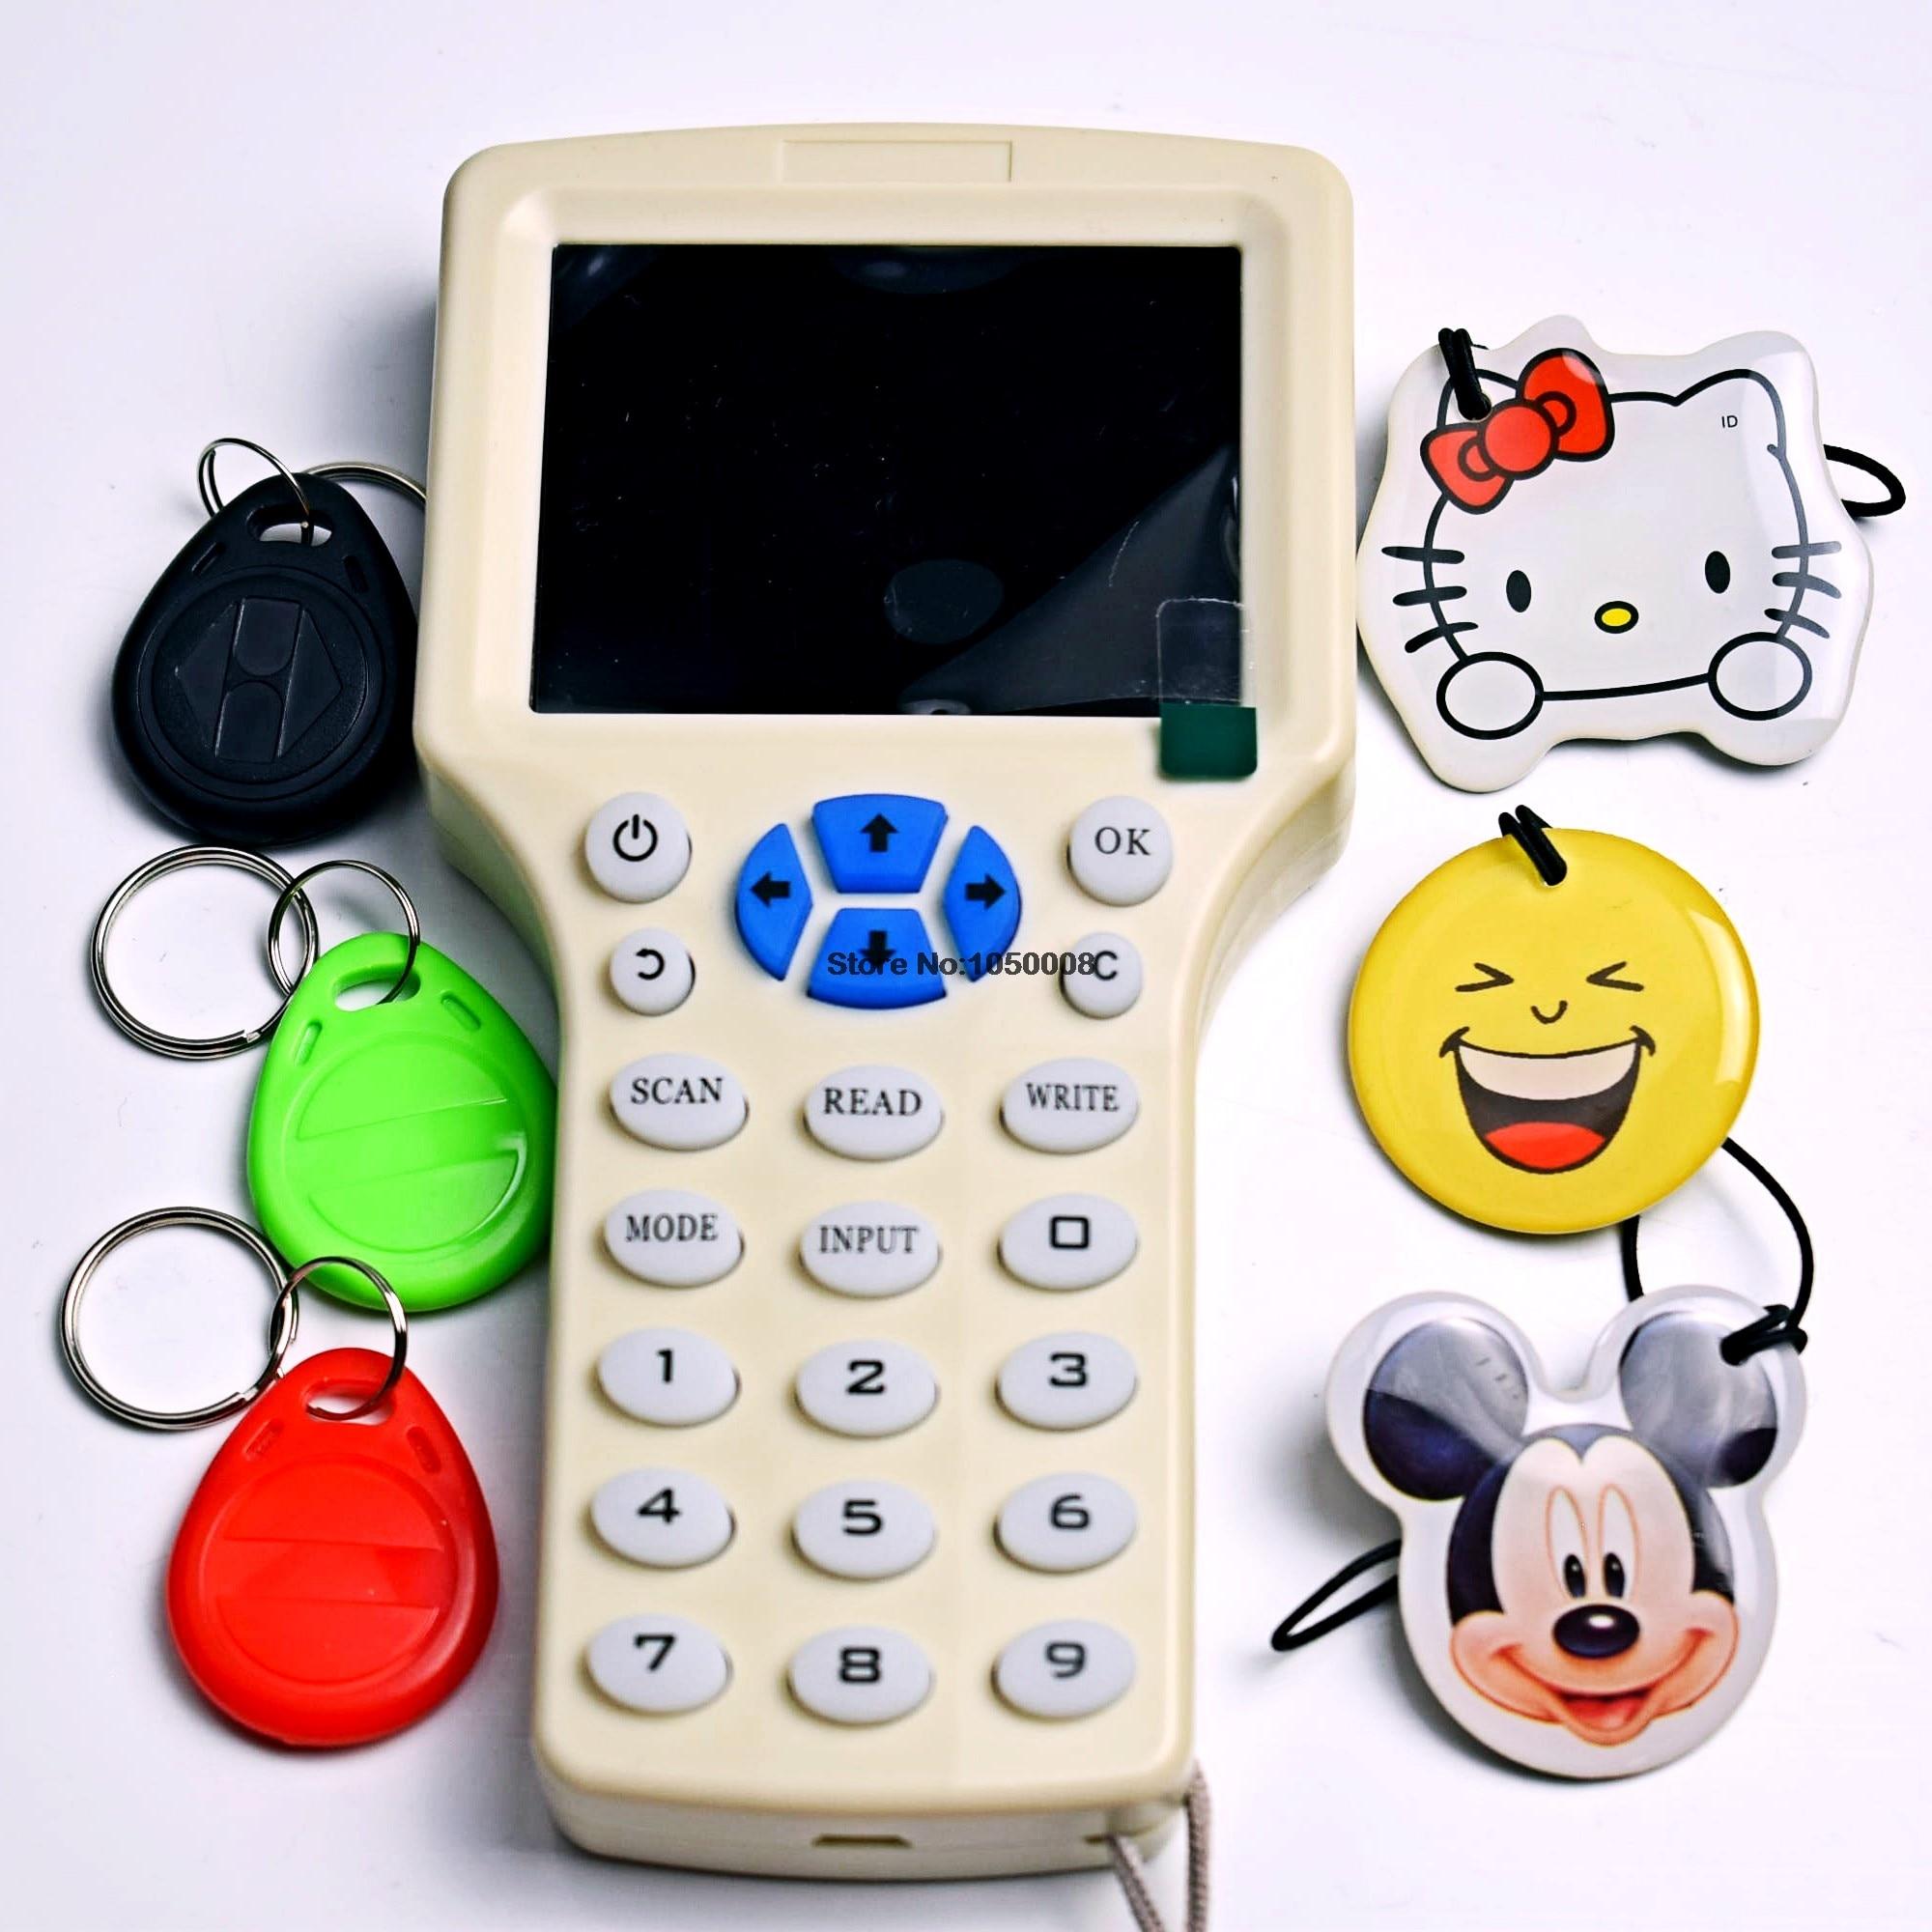 Inglese NFC Rfid Copier Reader Writer duplicator 10 Frequenza Programmatore + 3 pz 125 khz T5577 Scrivibile Tag Epossidica + 3 pz T5577 Key